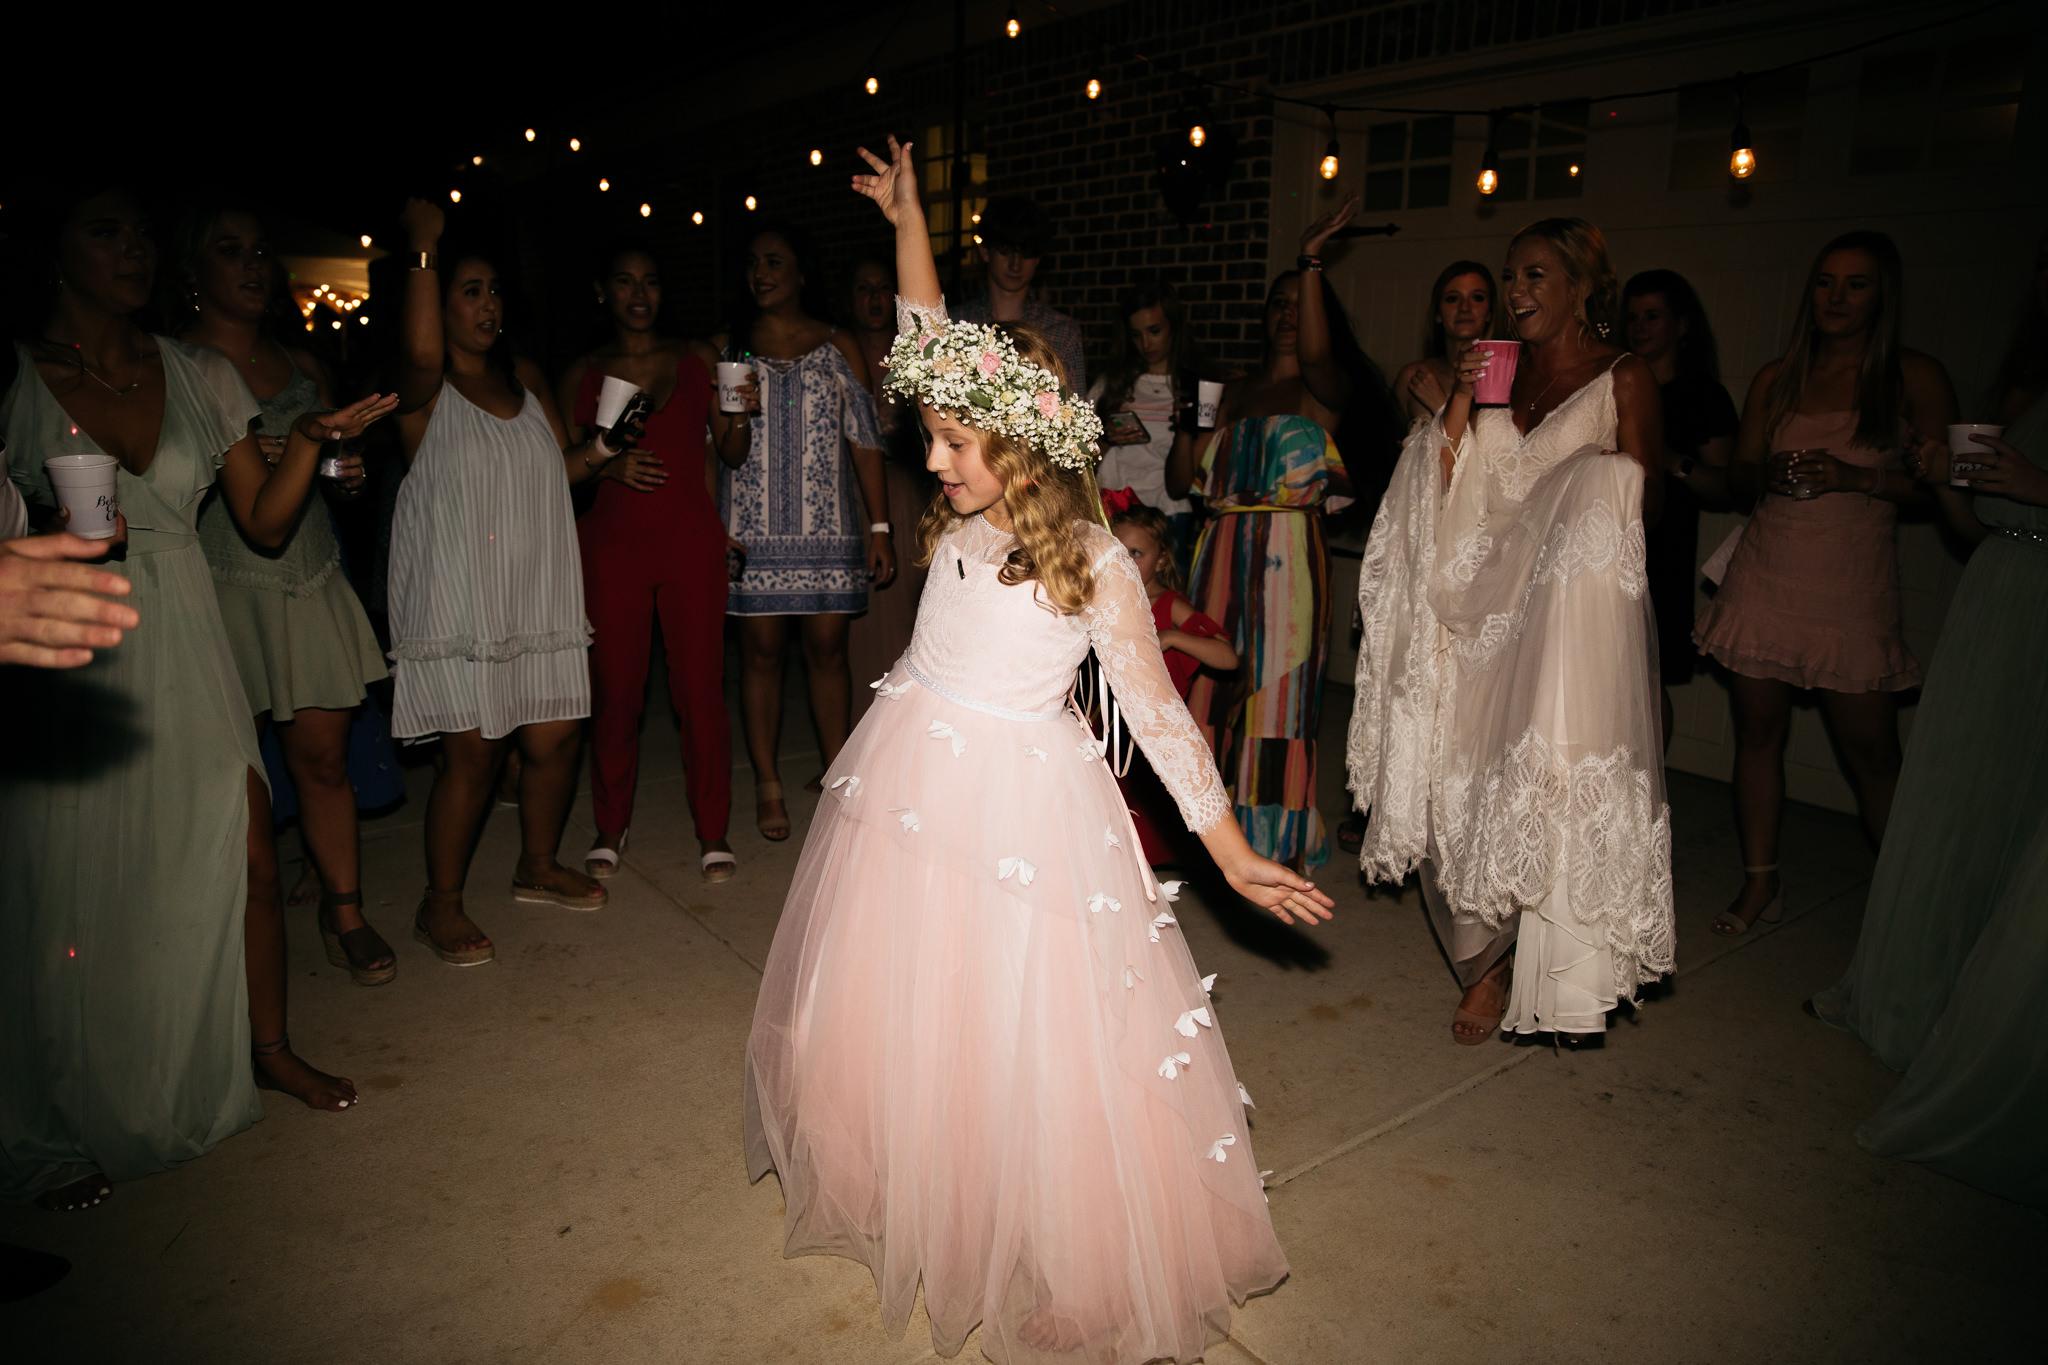 backyard-wedding-thewarmtharoundyou-lexy-branson-89.jpg